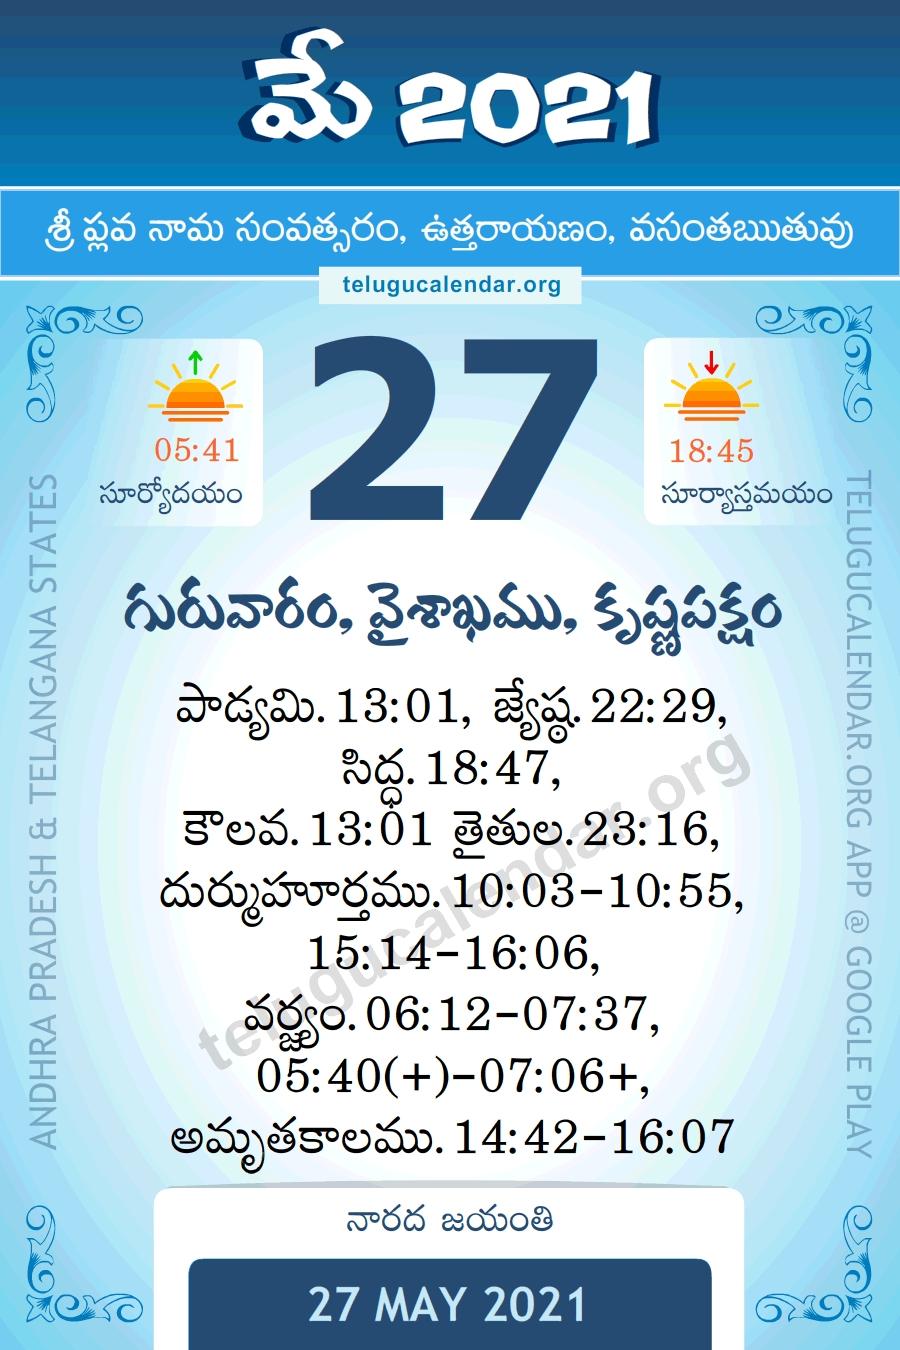 27 May 2021 Panchangam Calendar Daily In Telugu with regard to Telugu Calendar 2021 Panchangam Graphics